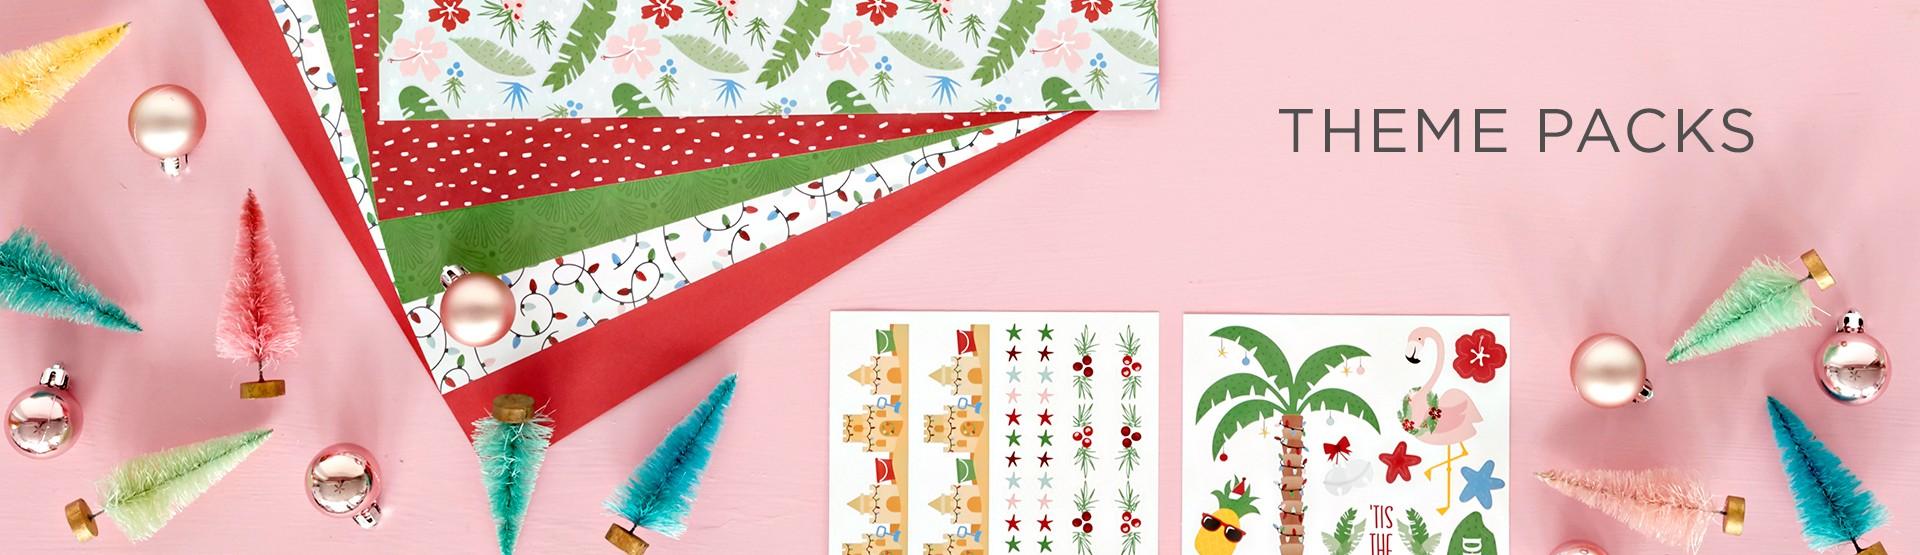 Theme Packs: Themed Layout Kits